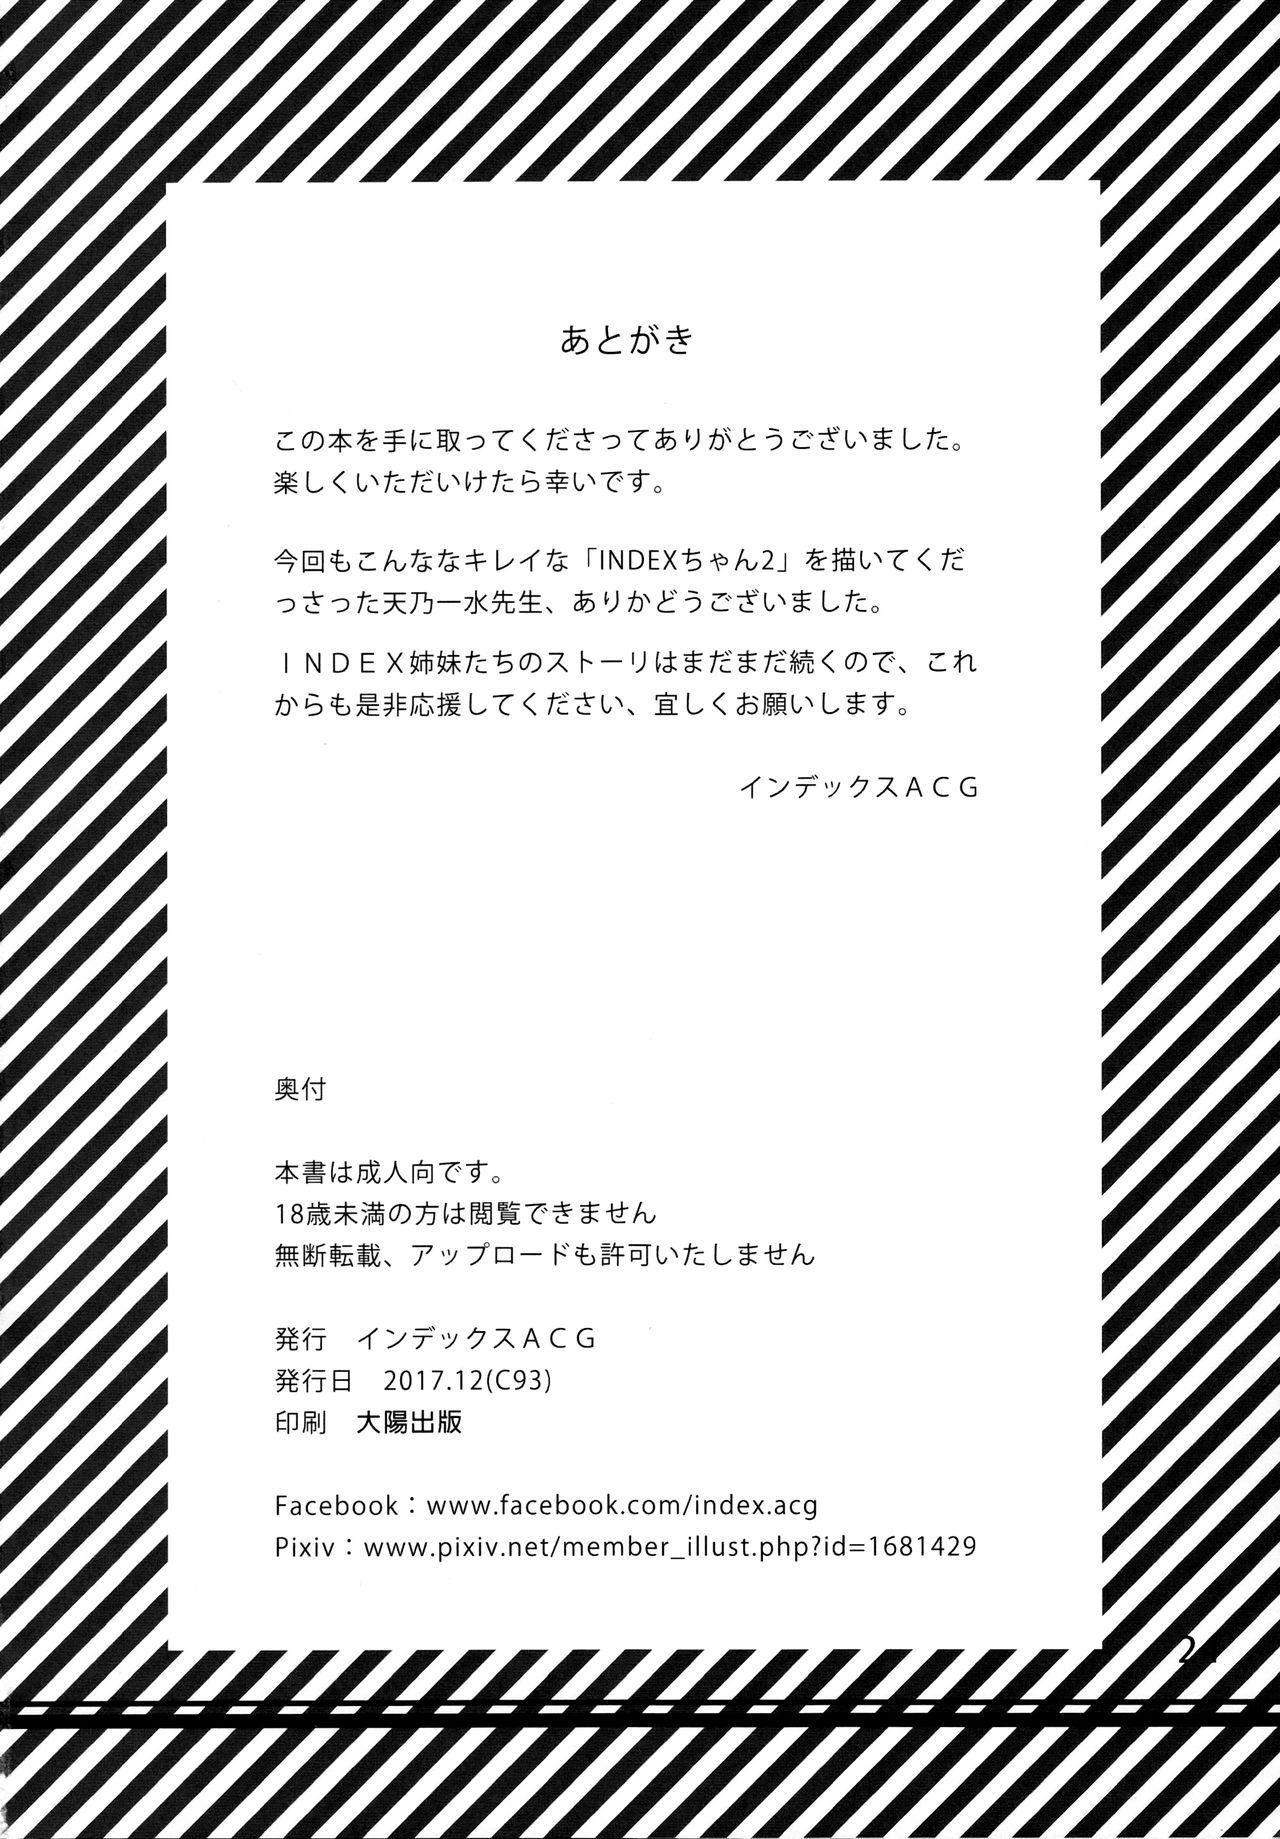 INDEXGIRLS 11 Index-chan no hageshii Mousou Yuukii 25